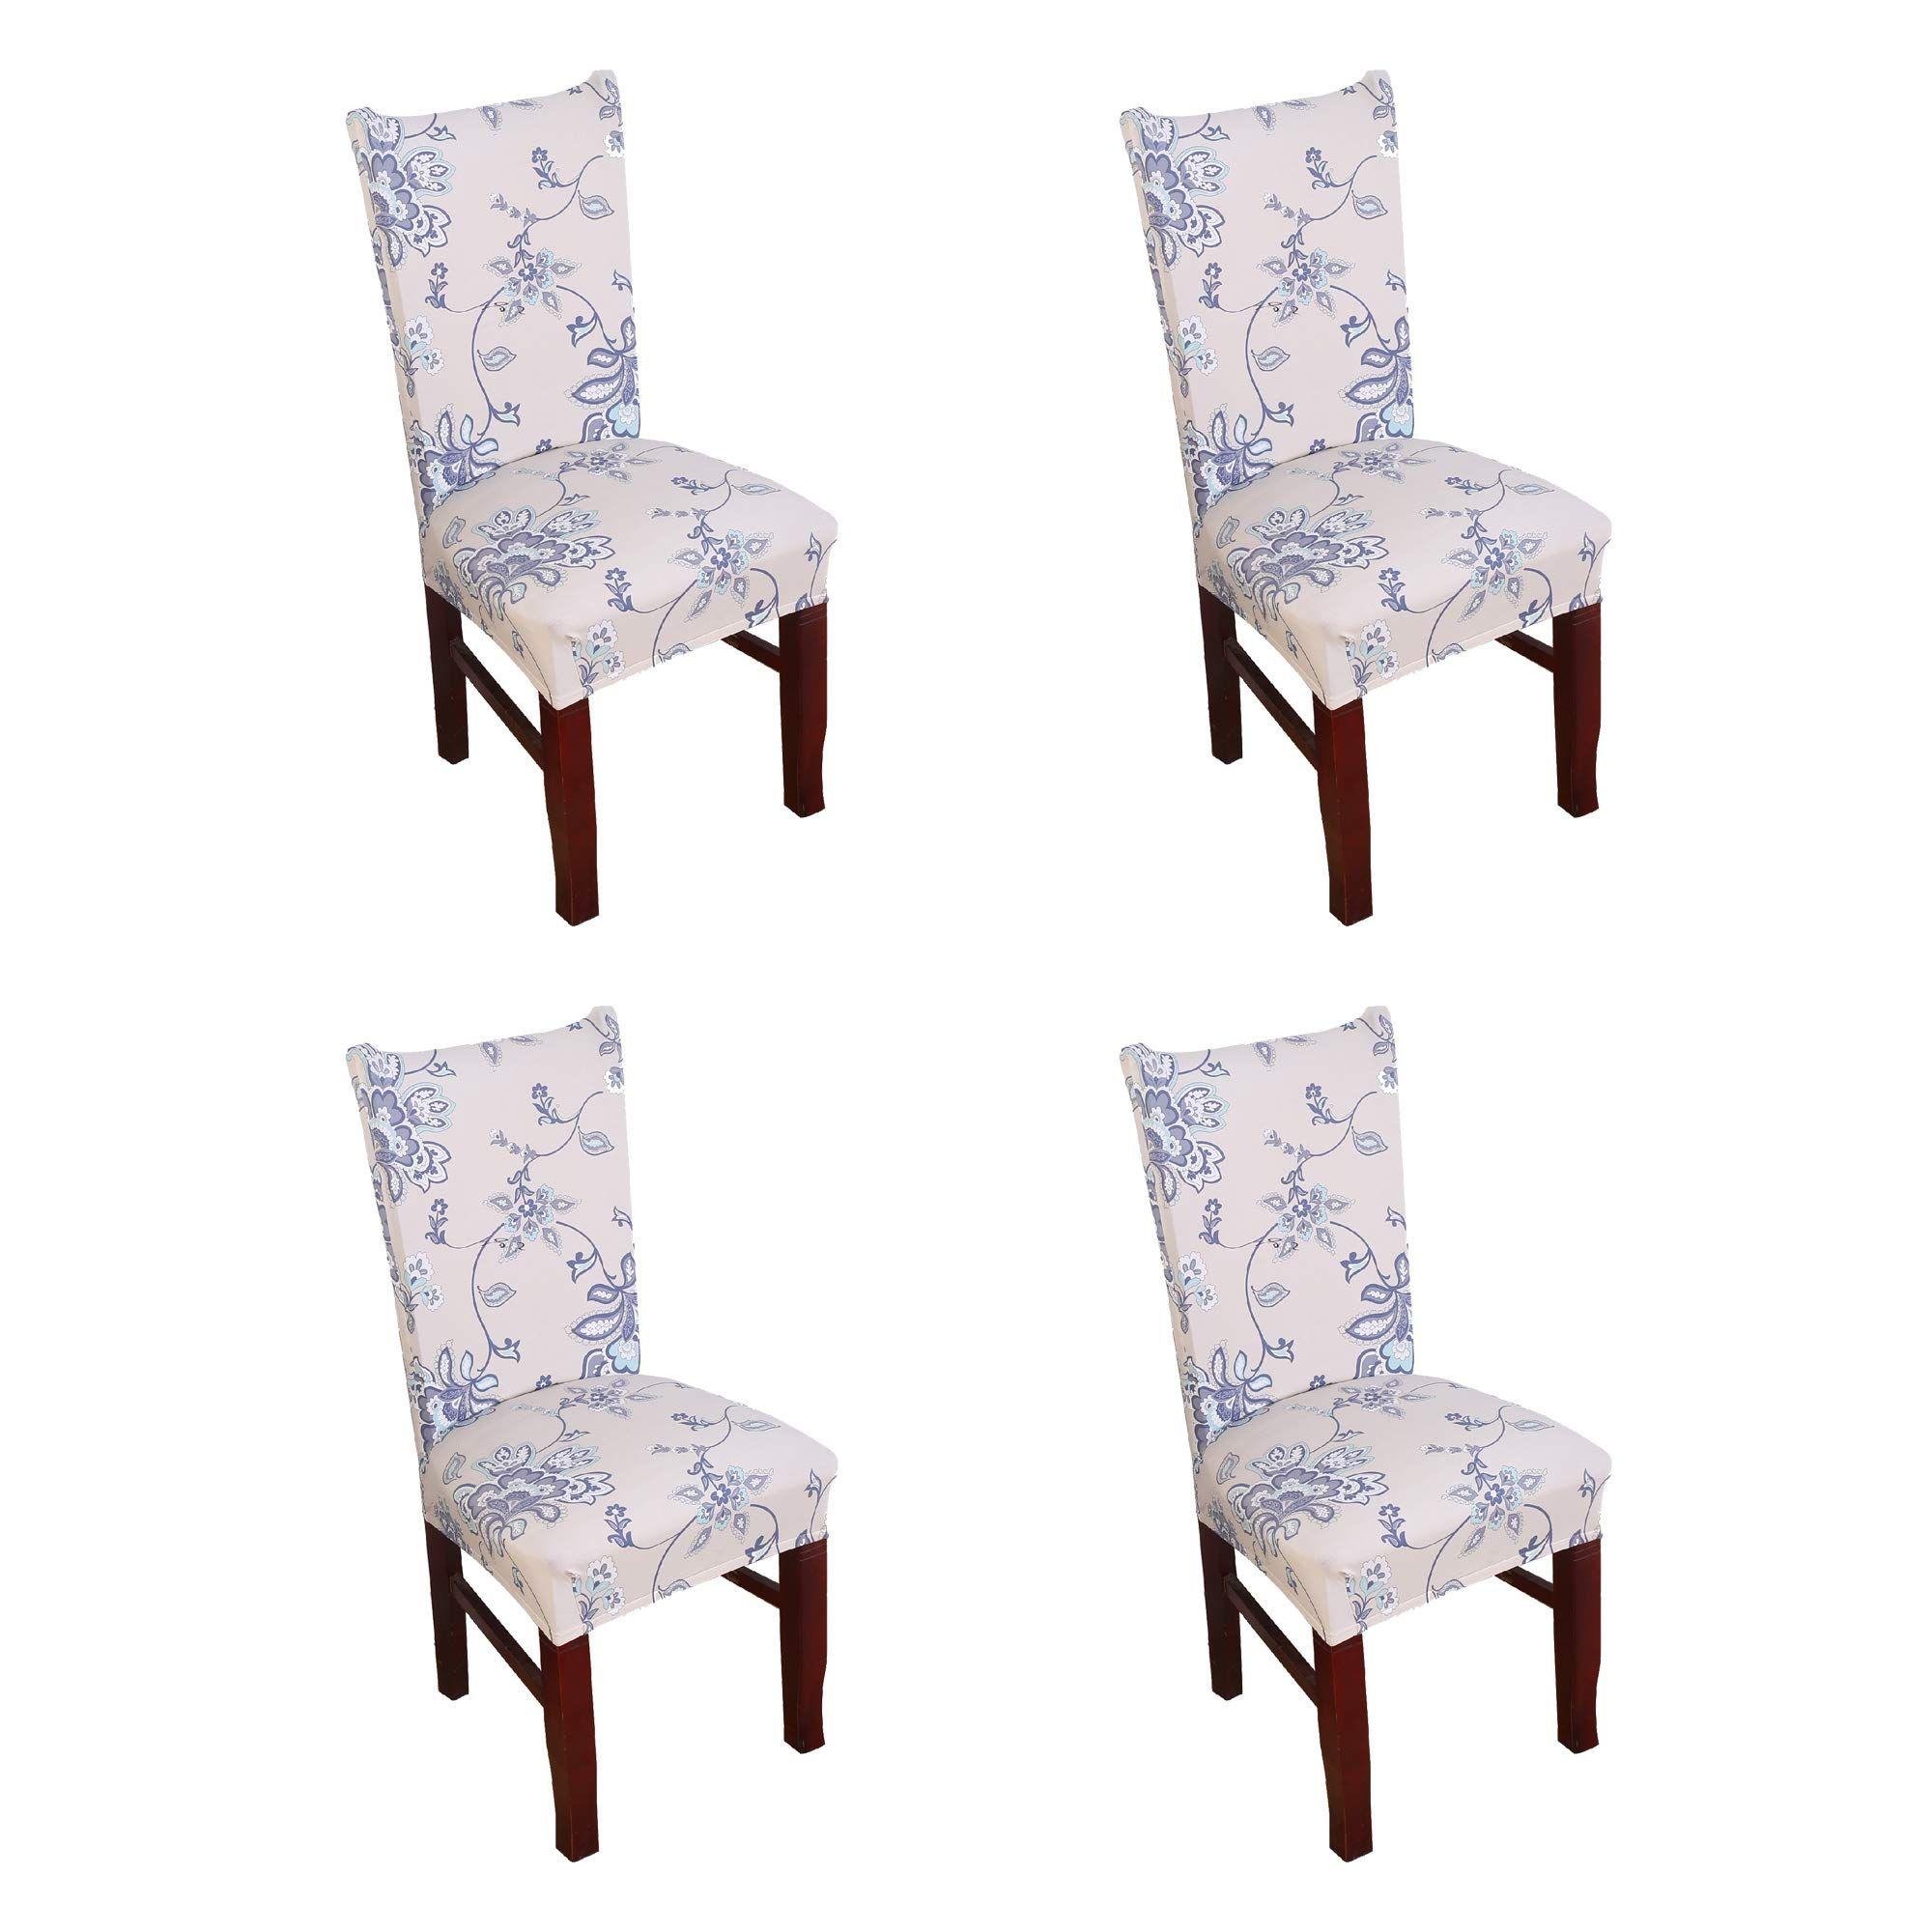 Argstar 4 Pack Chair Covers, Stretch Armless Chair